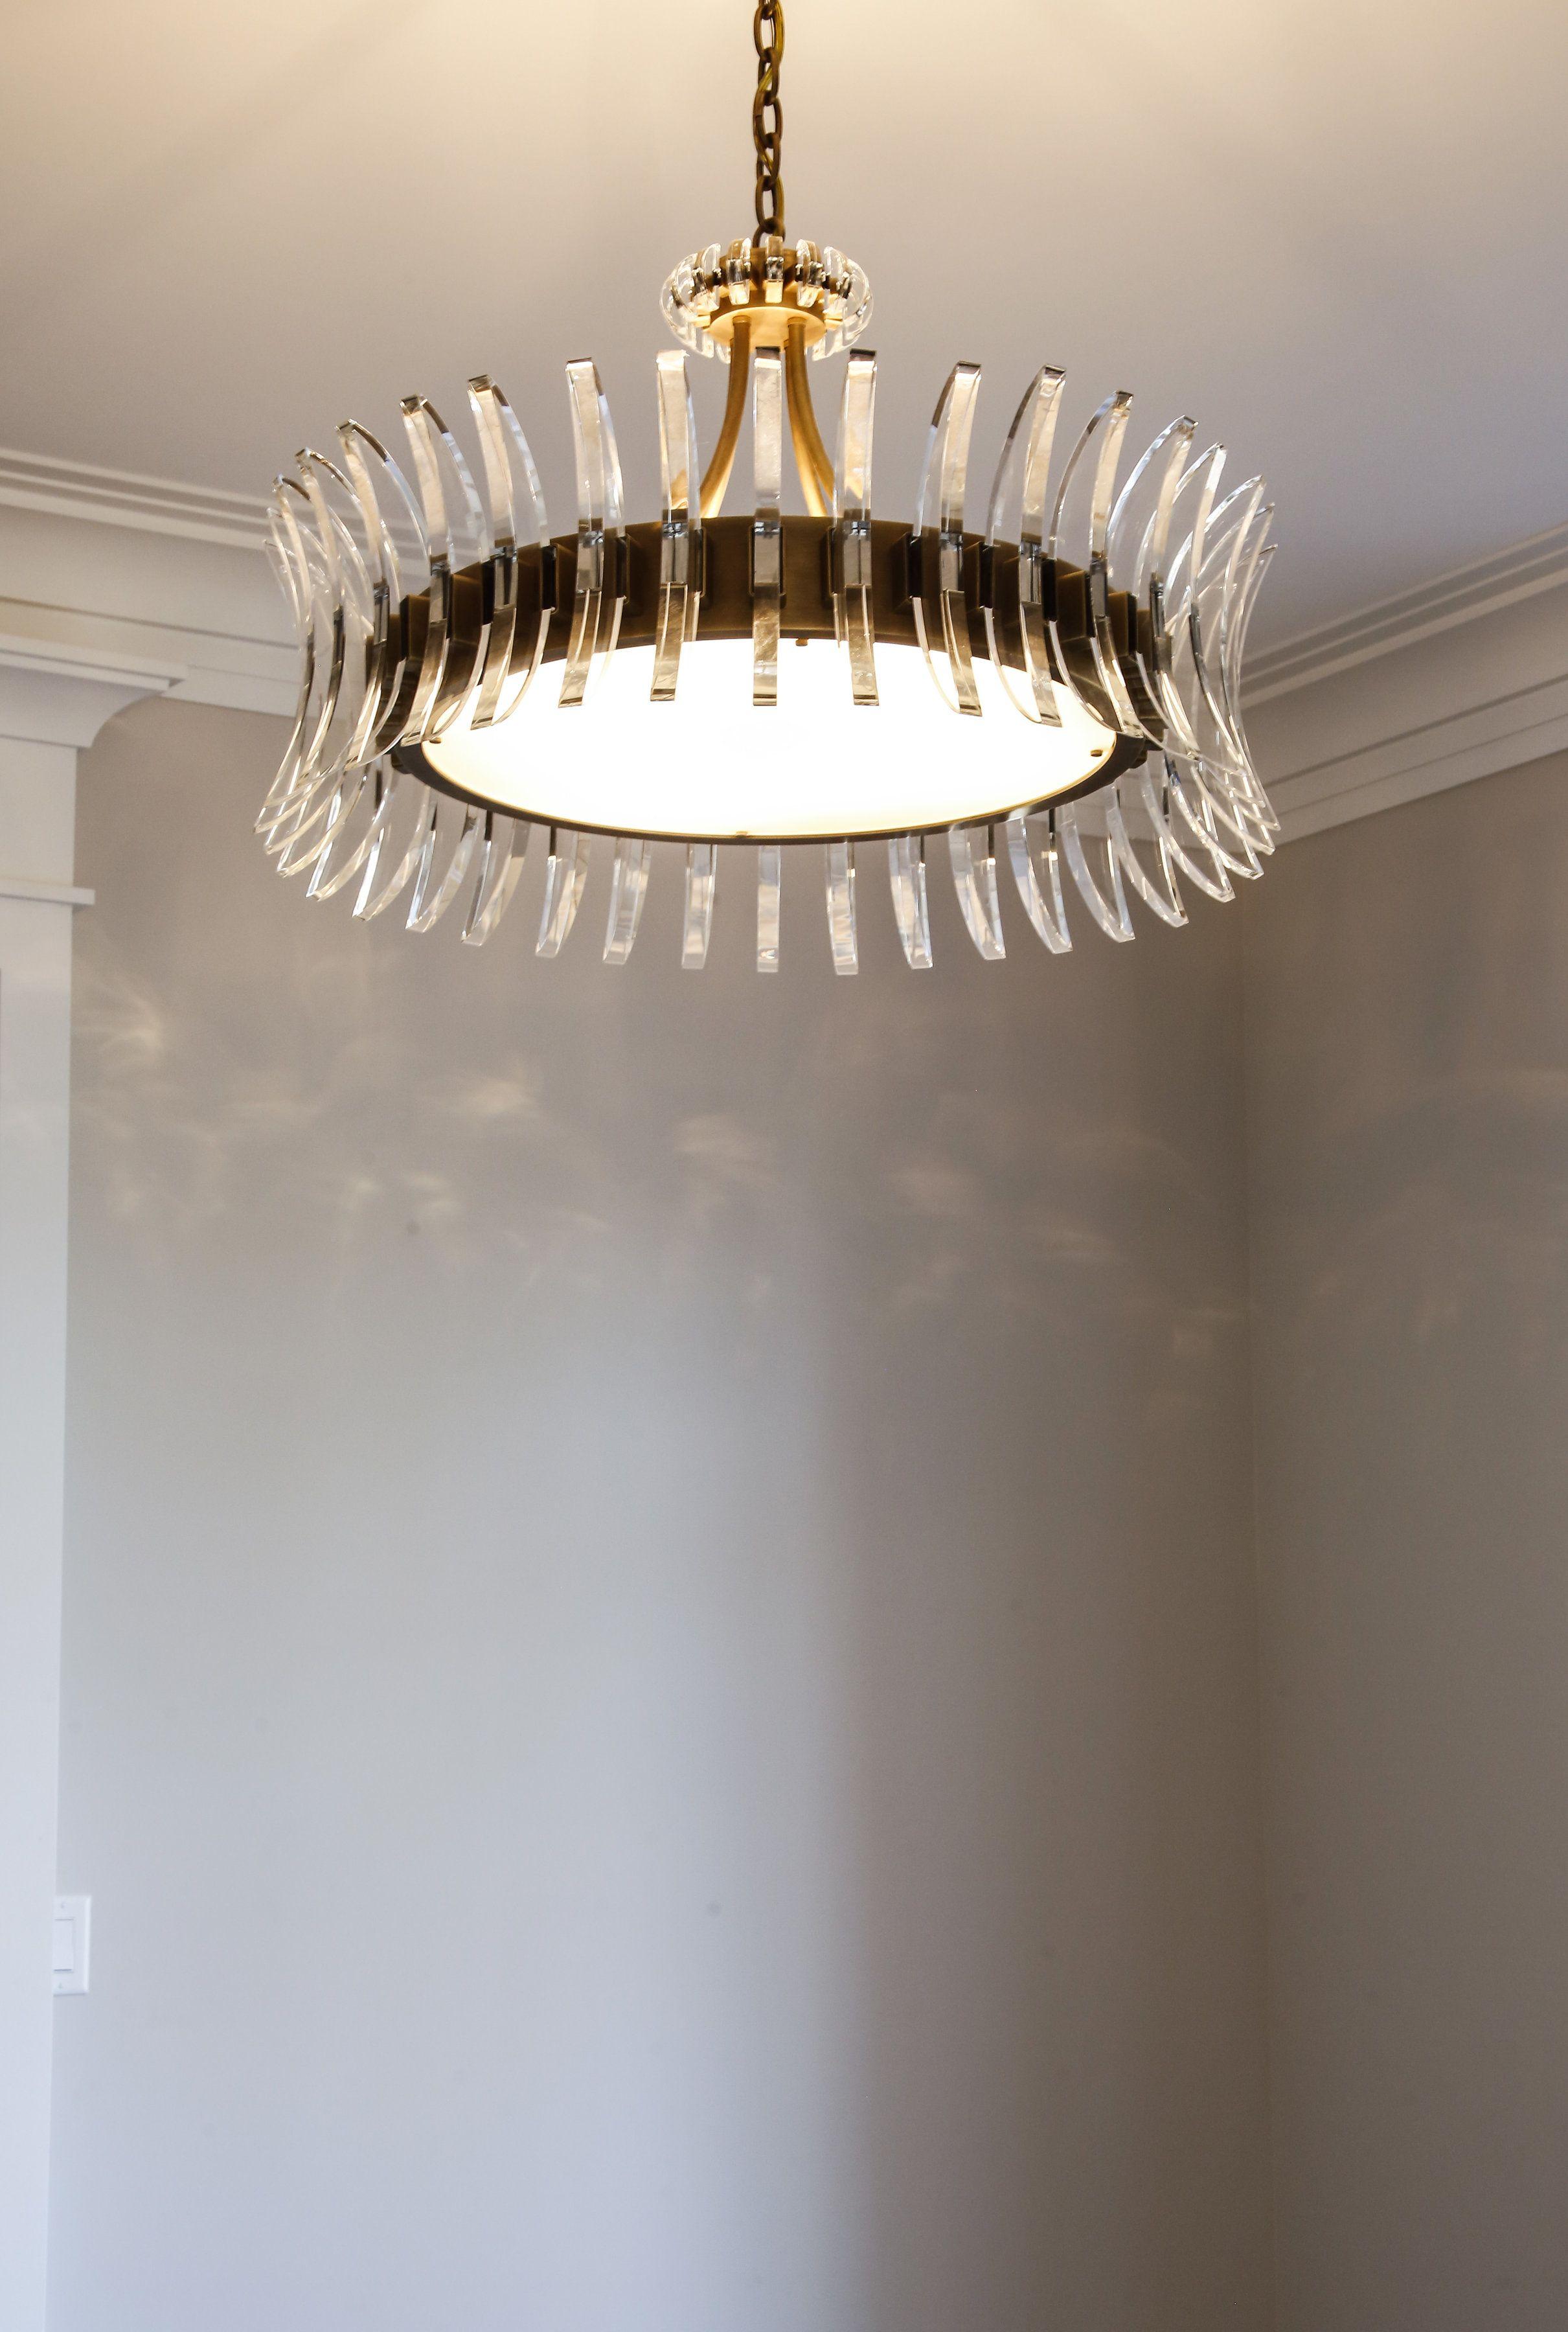 Lighting Design By Erin Schwartz Private Home In Clifton Virginia Still Under Construction Residential Lighting Ceiling Fan Commercial Lighting